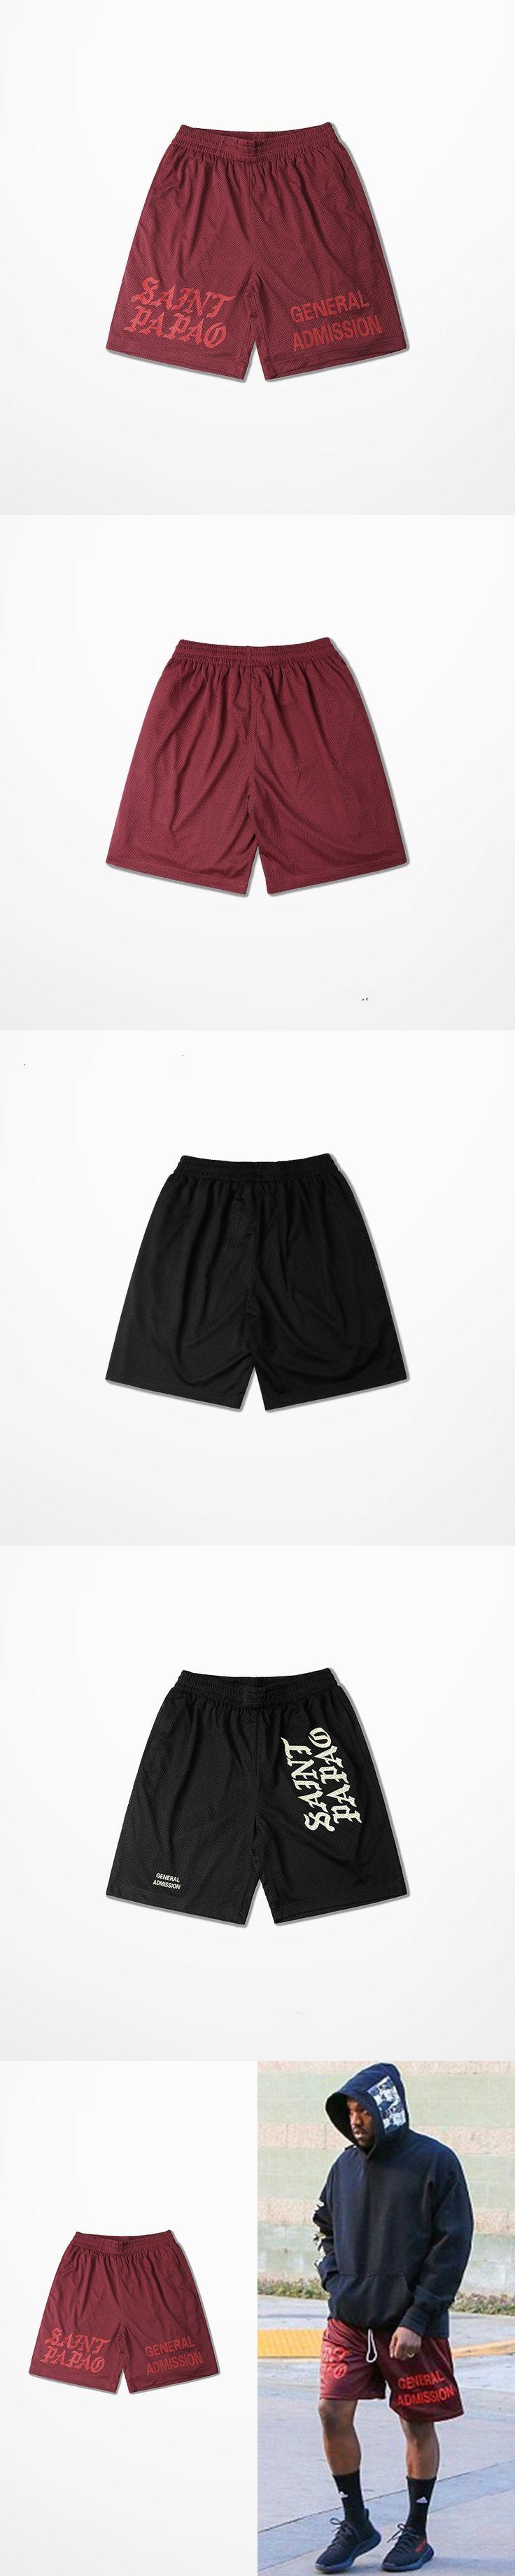 Casual Calabasas Shorts Men Kanye West Saint Pablo Seobean Short Hip Hop Drake Summer Fashion Brand Men's Short Pants